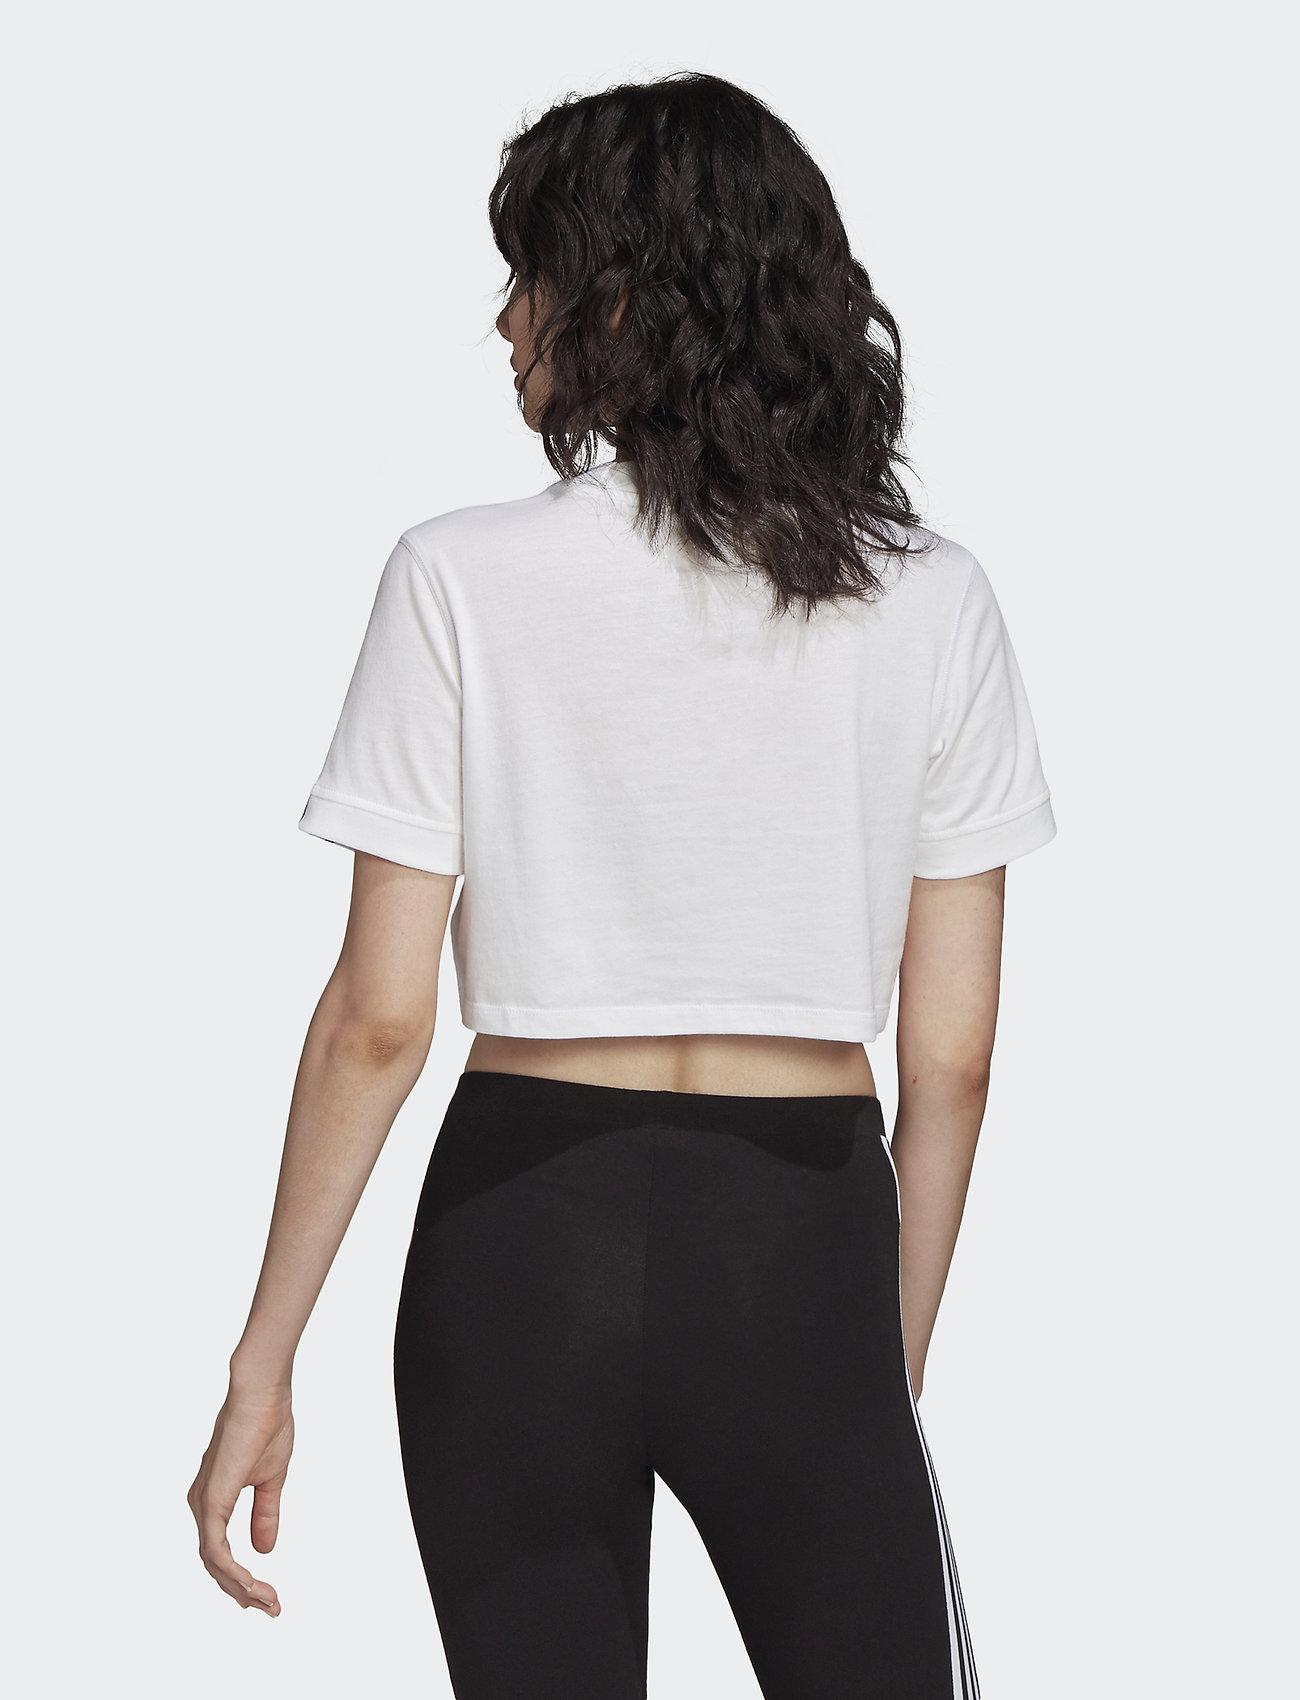 Tee Cropped (White) (279 kr) - adidas Originals